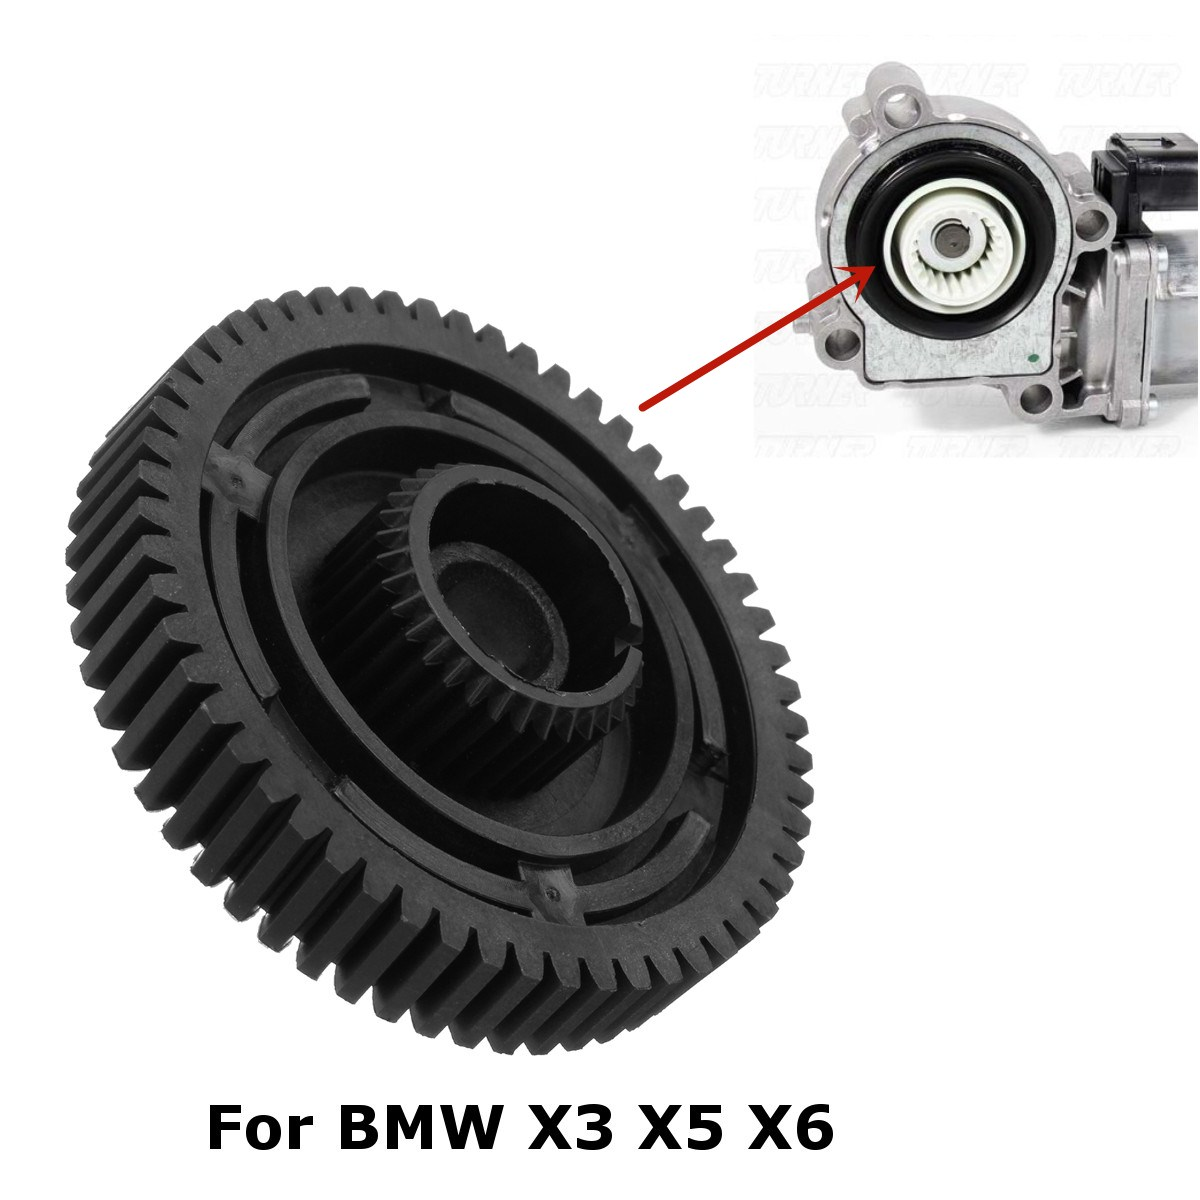 27107566296 Car Repair Gear Box Servo Actuator Motor Transfer Case For BMW X3 X5 X6 E83 E53 E70